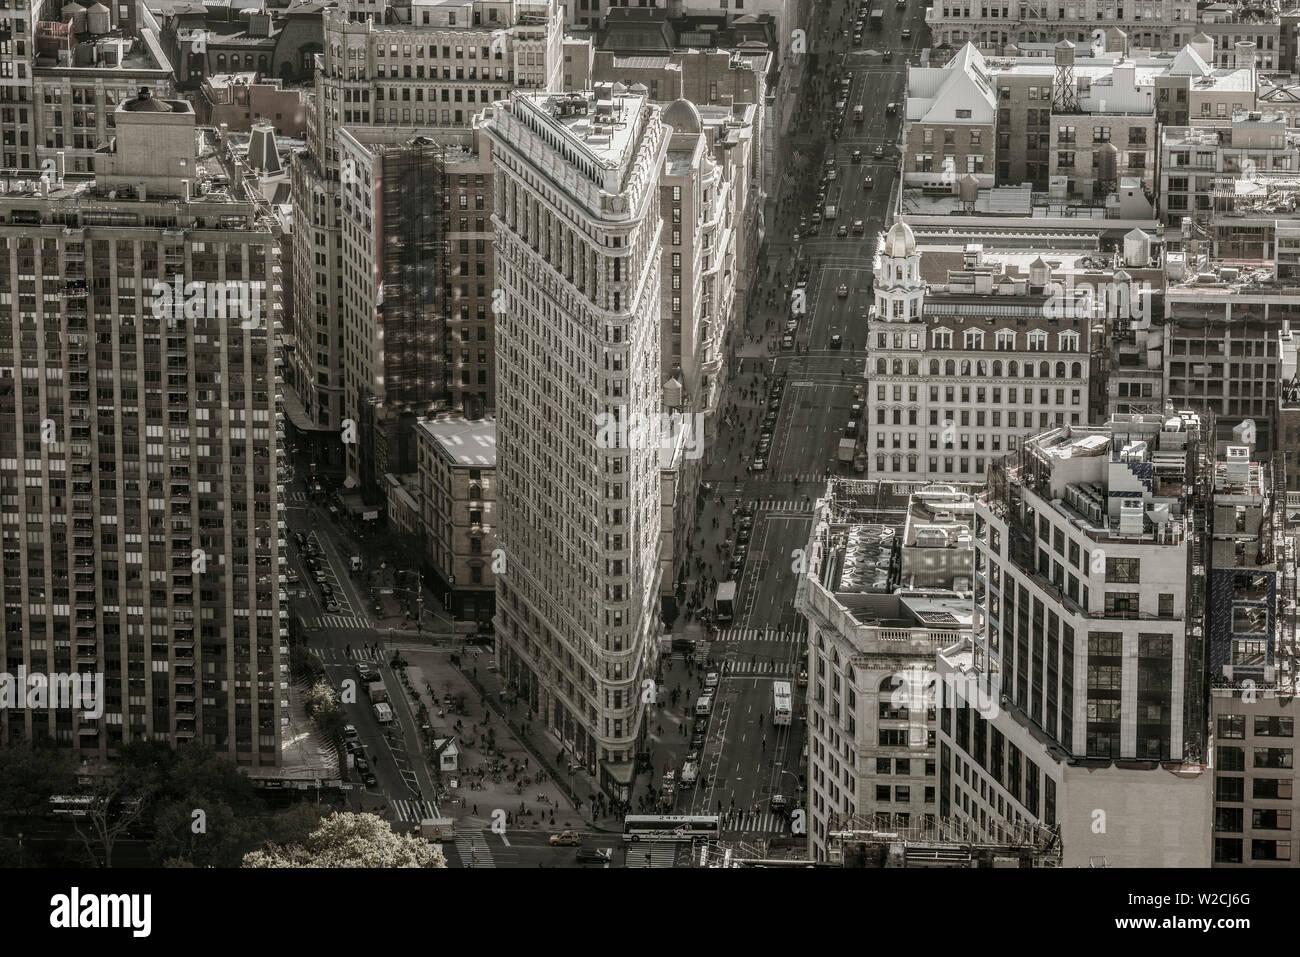 USA, New York, Manhattan, Midtown, The Flatiron Building - Stock Image